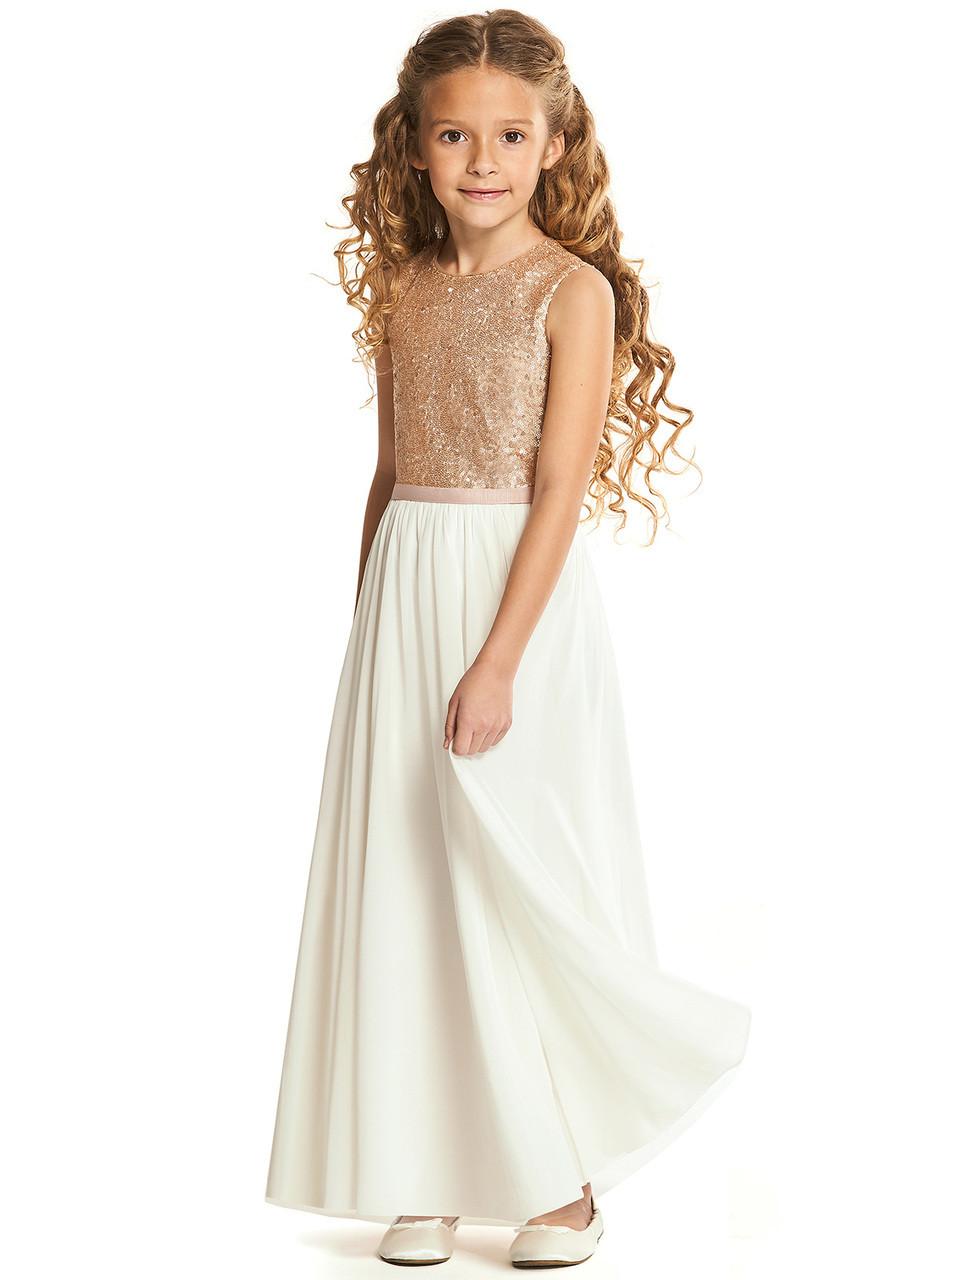 32c9934dc7ce Sequin Ivory Skirt Dessy Flower Girls Dress FL4061 | Dimitra Designs